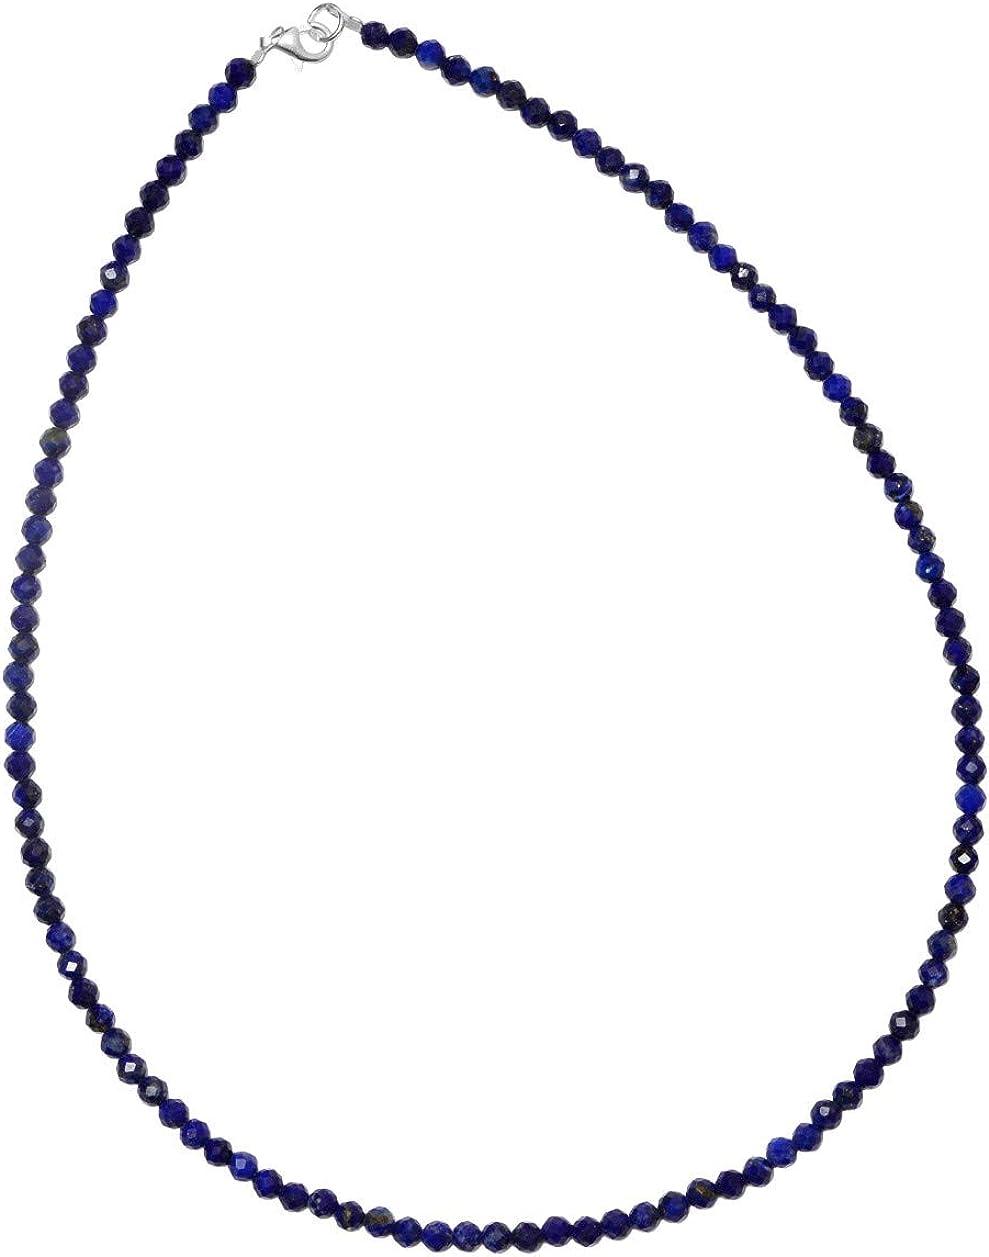 ERCE lapislázuli piedra semipreciosa collar, cierre de plata de ley 925, longitud 42 cm